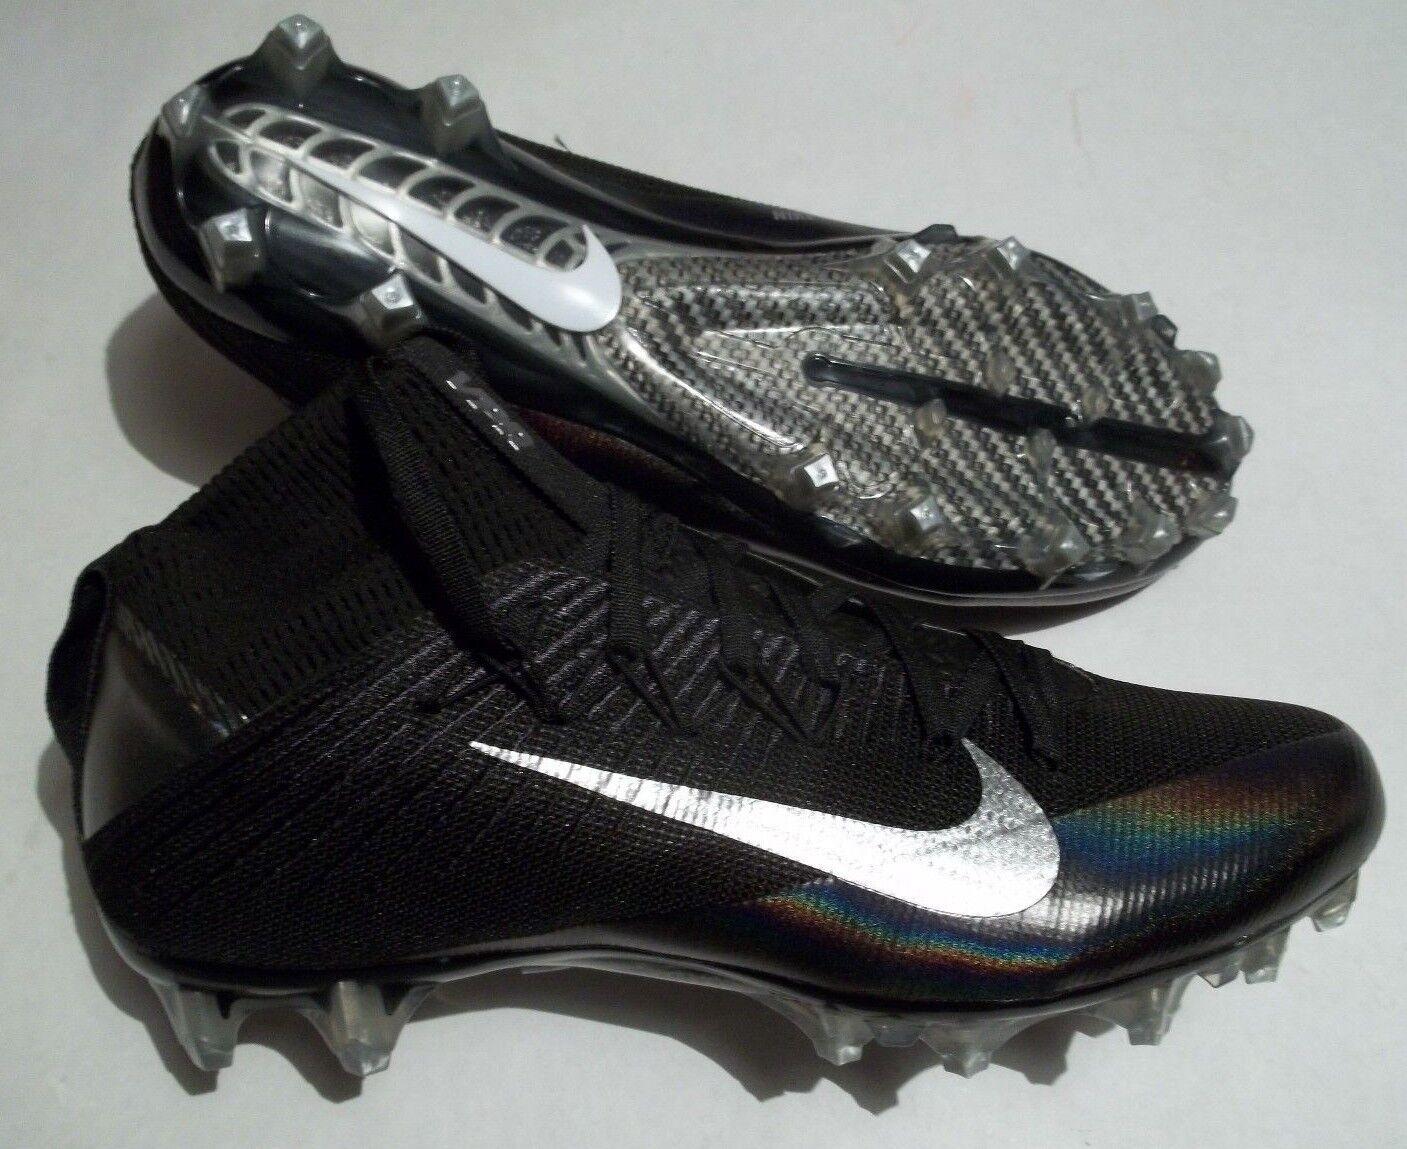 NEW Nike Vapor Untouchable 2 Carbon Football Cleats Many Sizes 824470-002